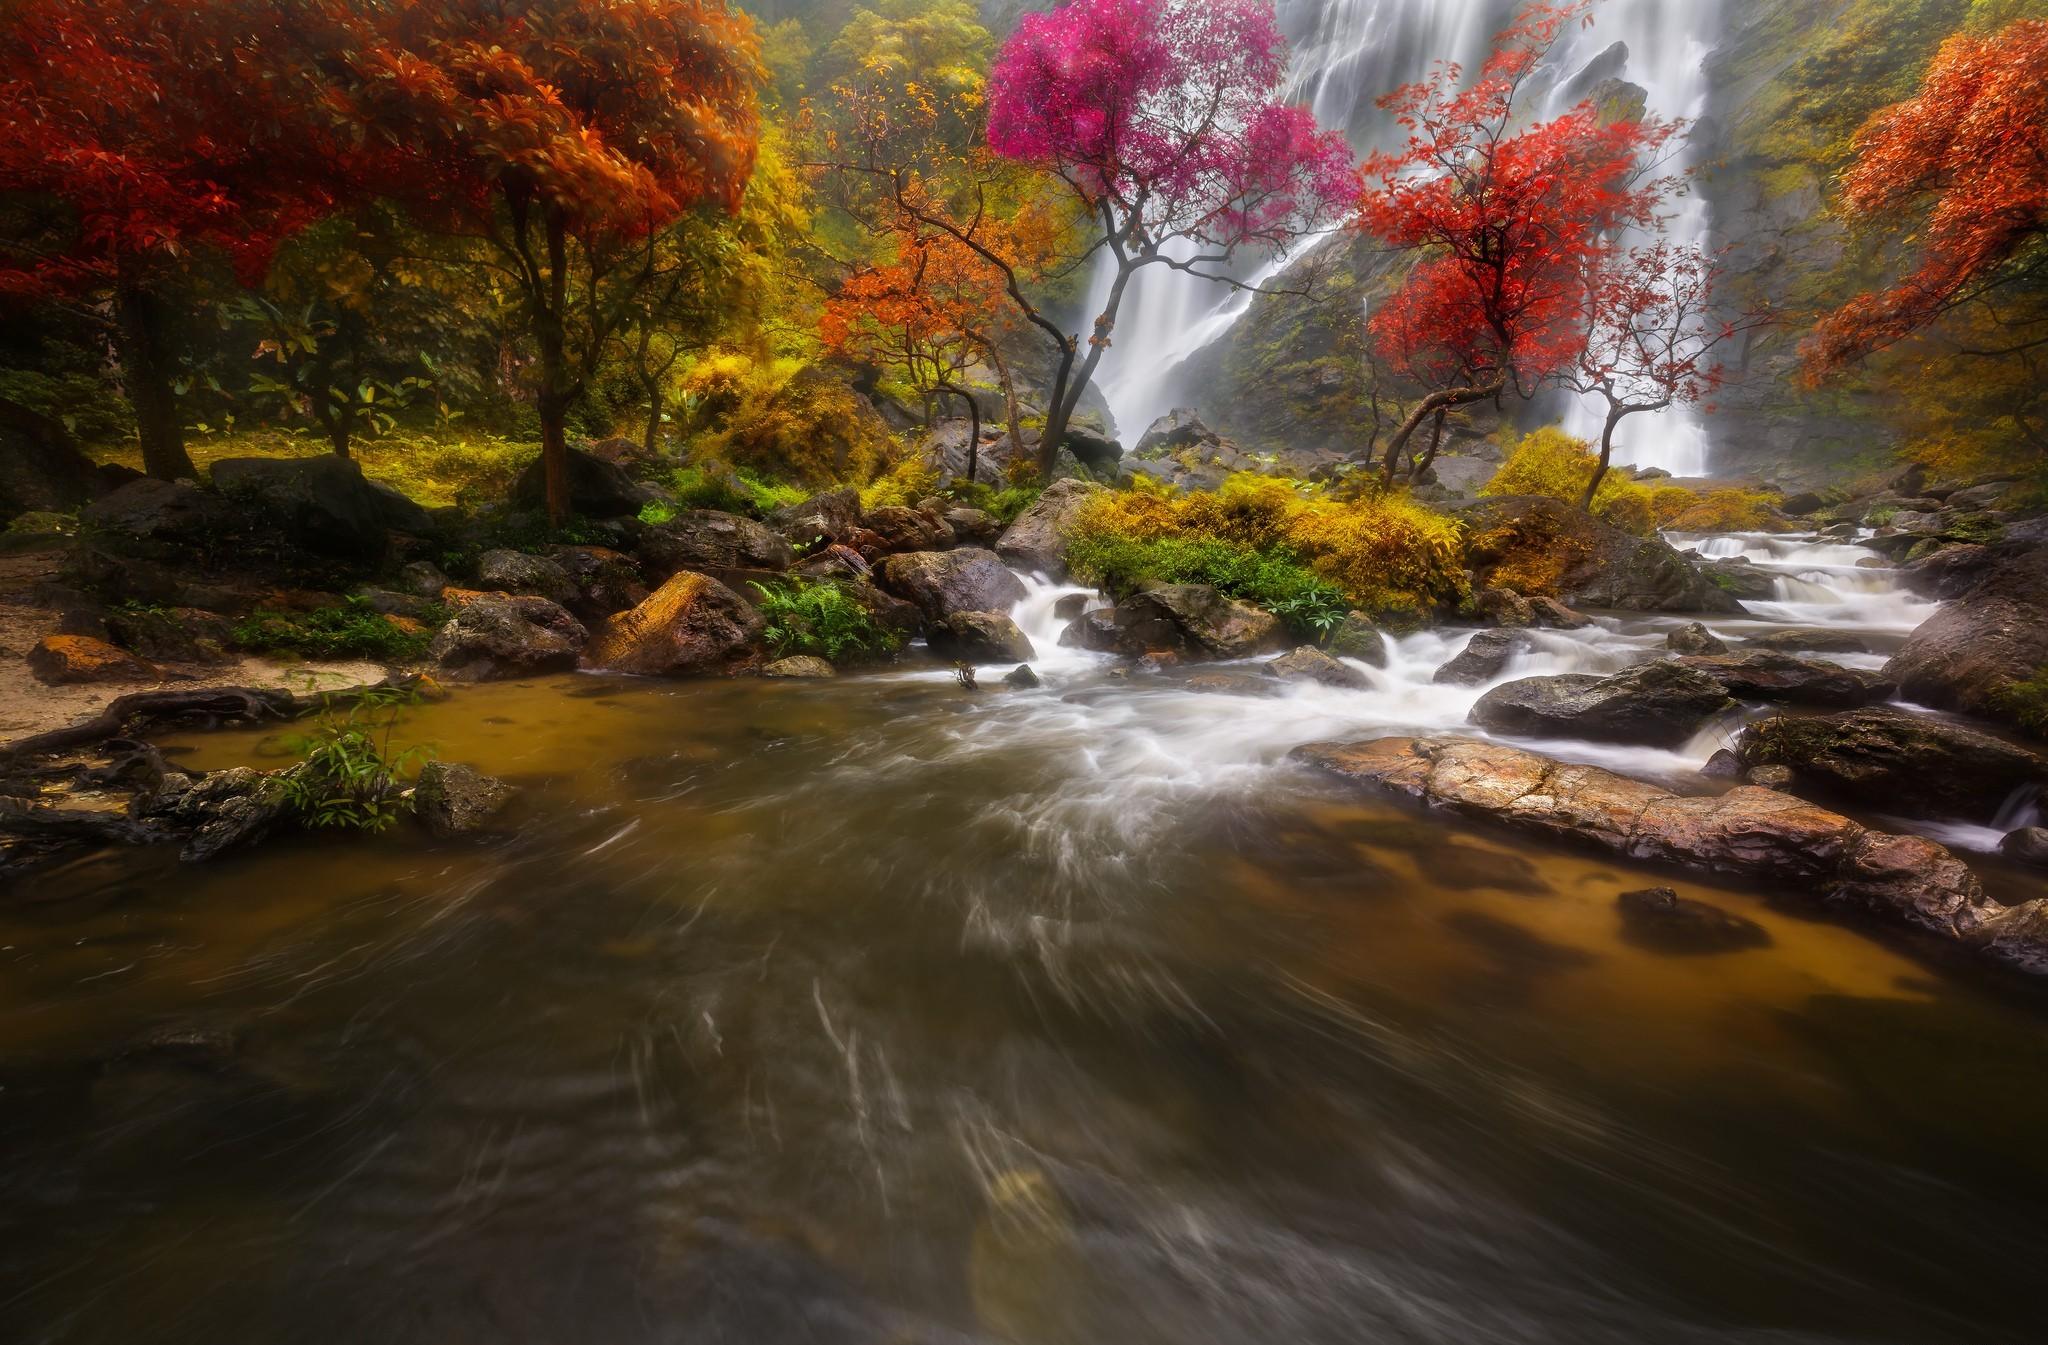 waterfall wallpaper hd for desktop free download